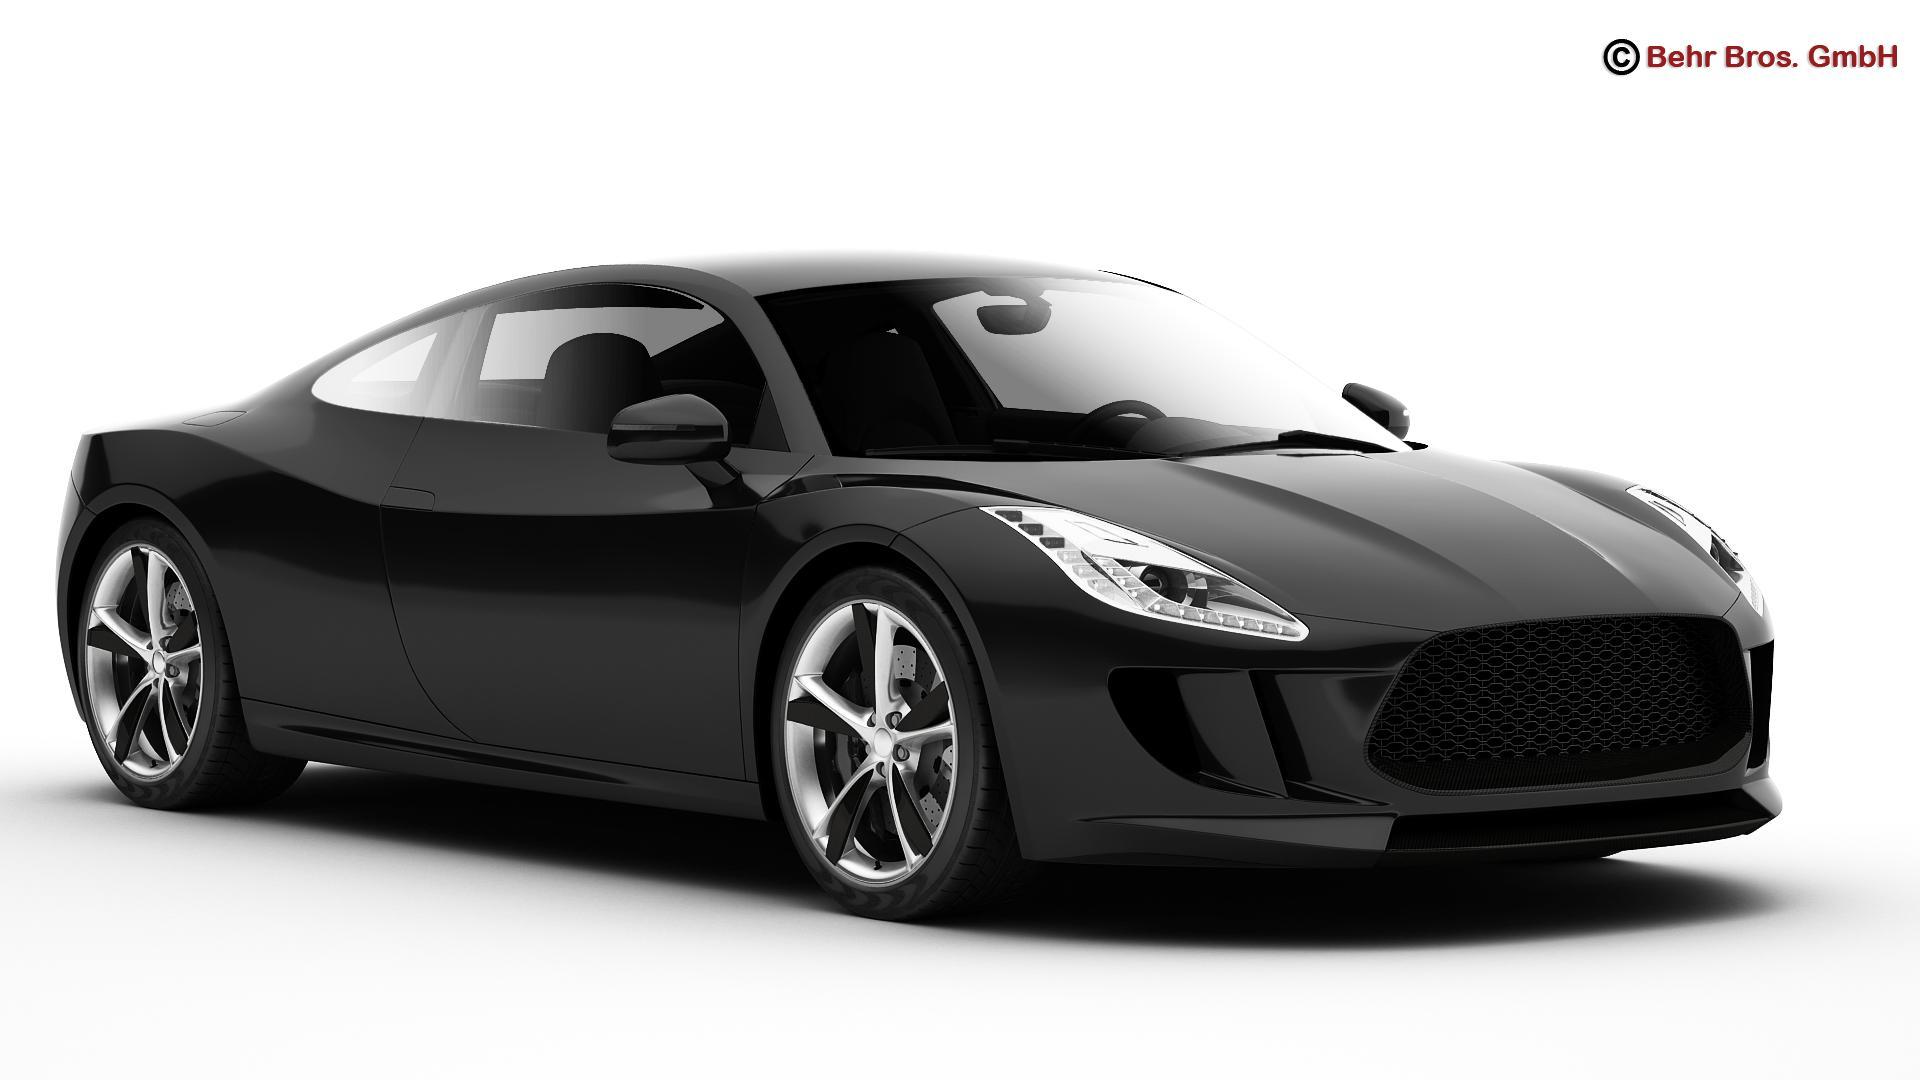 generic sports car 3d model 3ds max fbx c4d lwo ma mb obj 160518